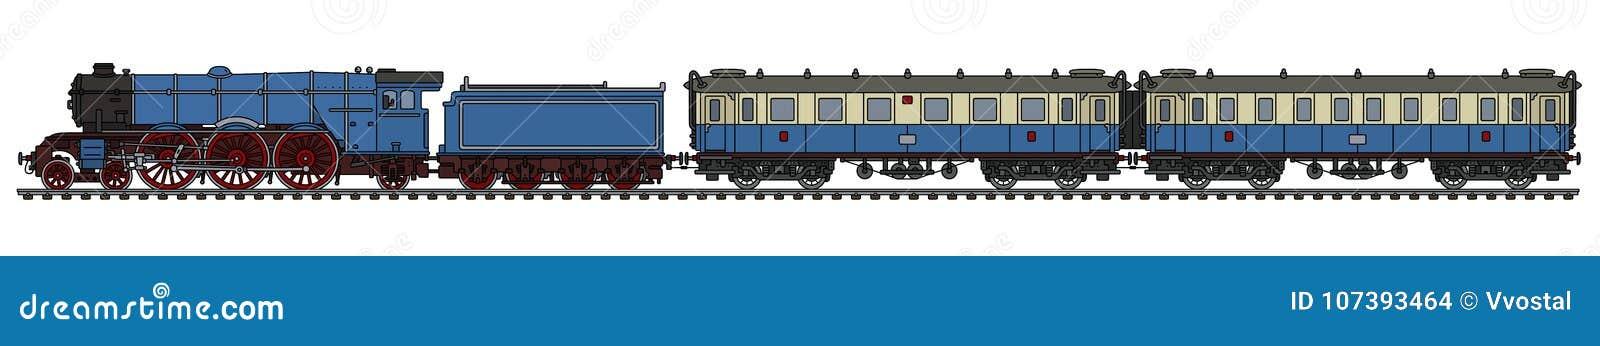 The Vintage Blue Passenger Steam Train Stock Vector Illustration